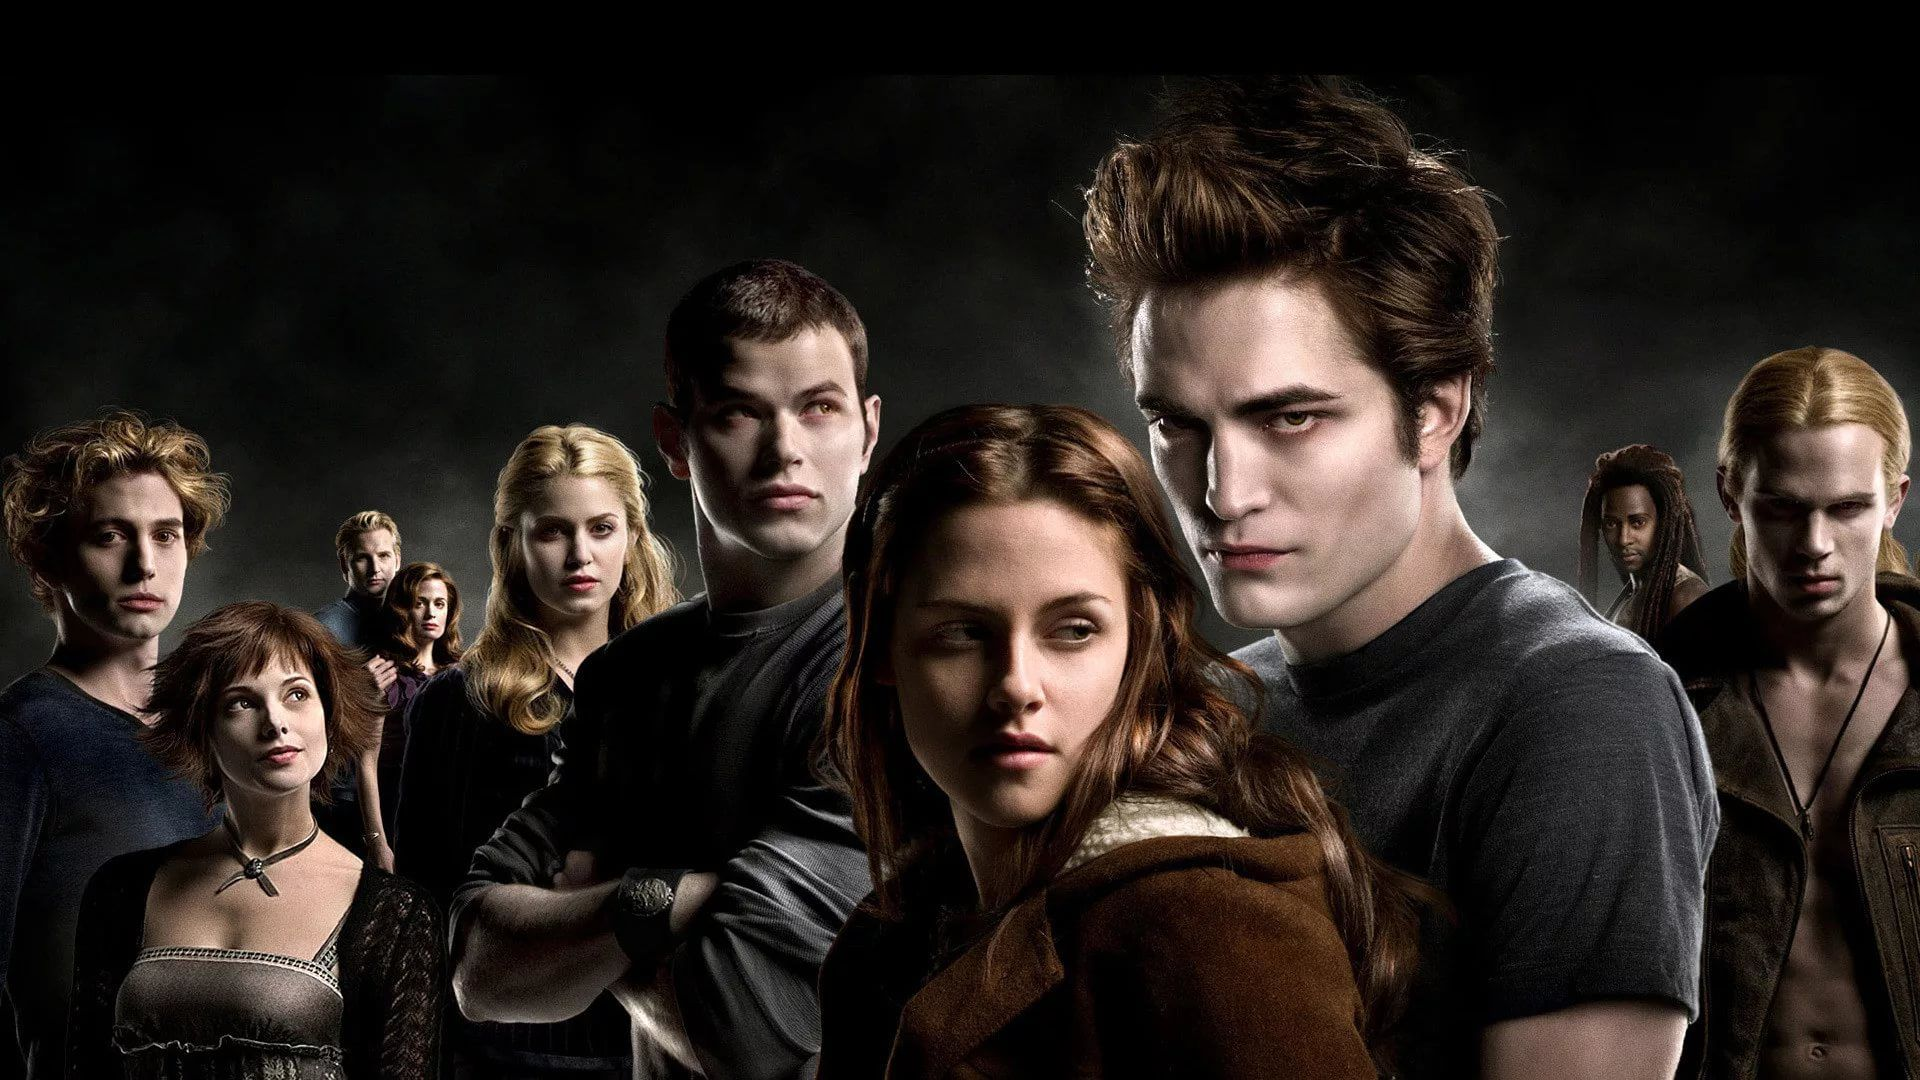 Twilight Saga new wallpaper